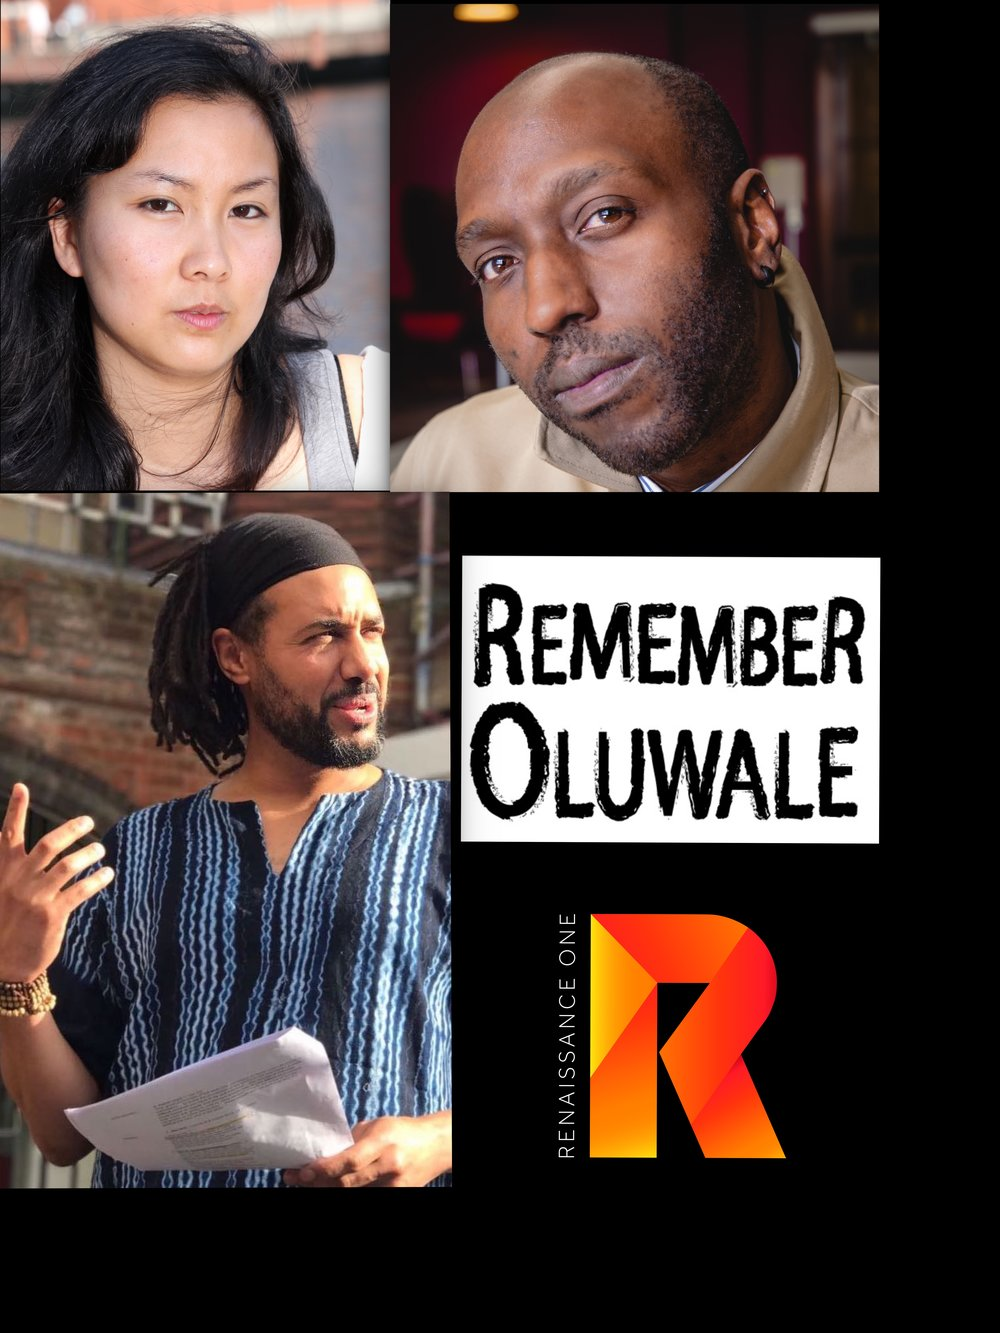 (L - R clockwise) Naomi Sumner Chan, Kei Miller, David Oluwale Memorial Association, Sai Murray